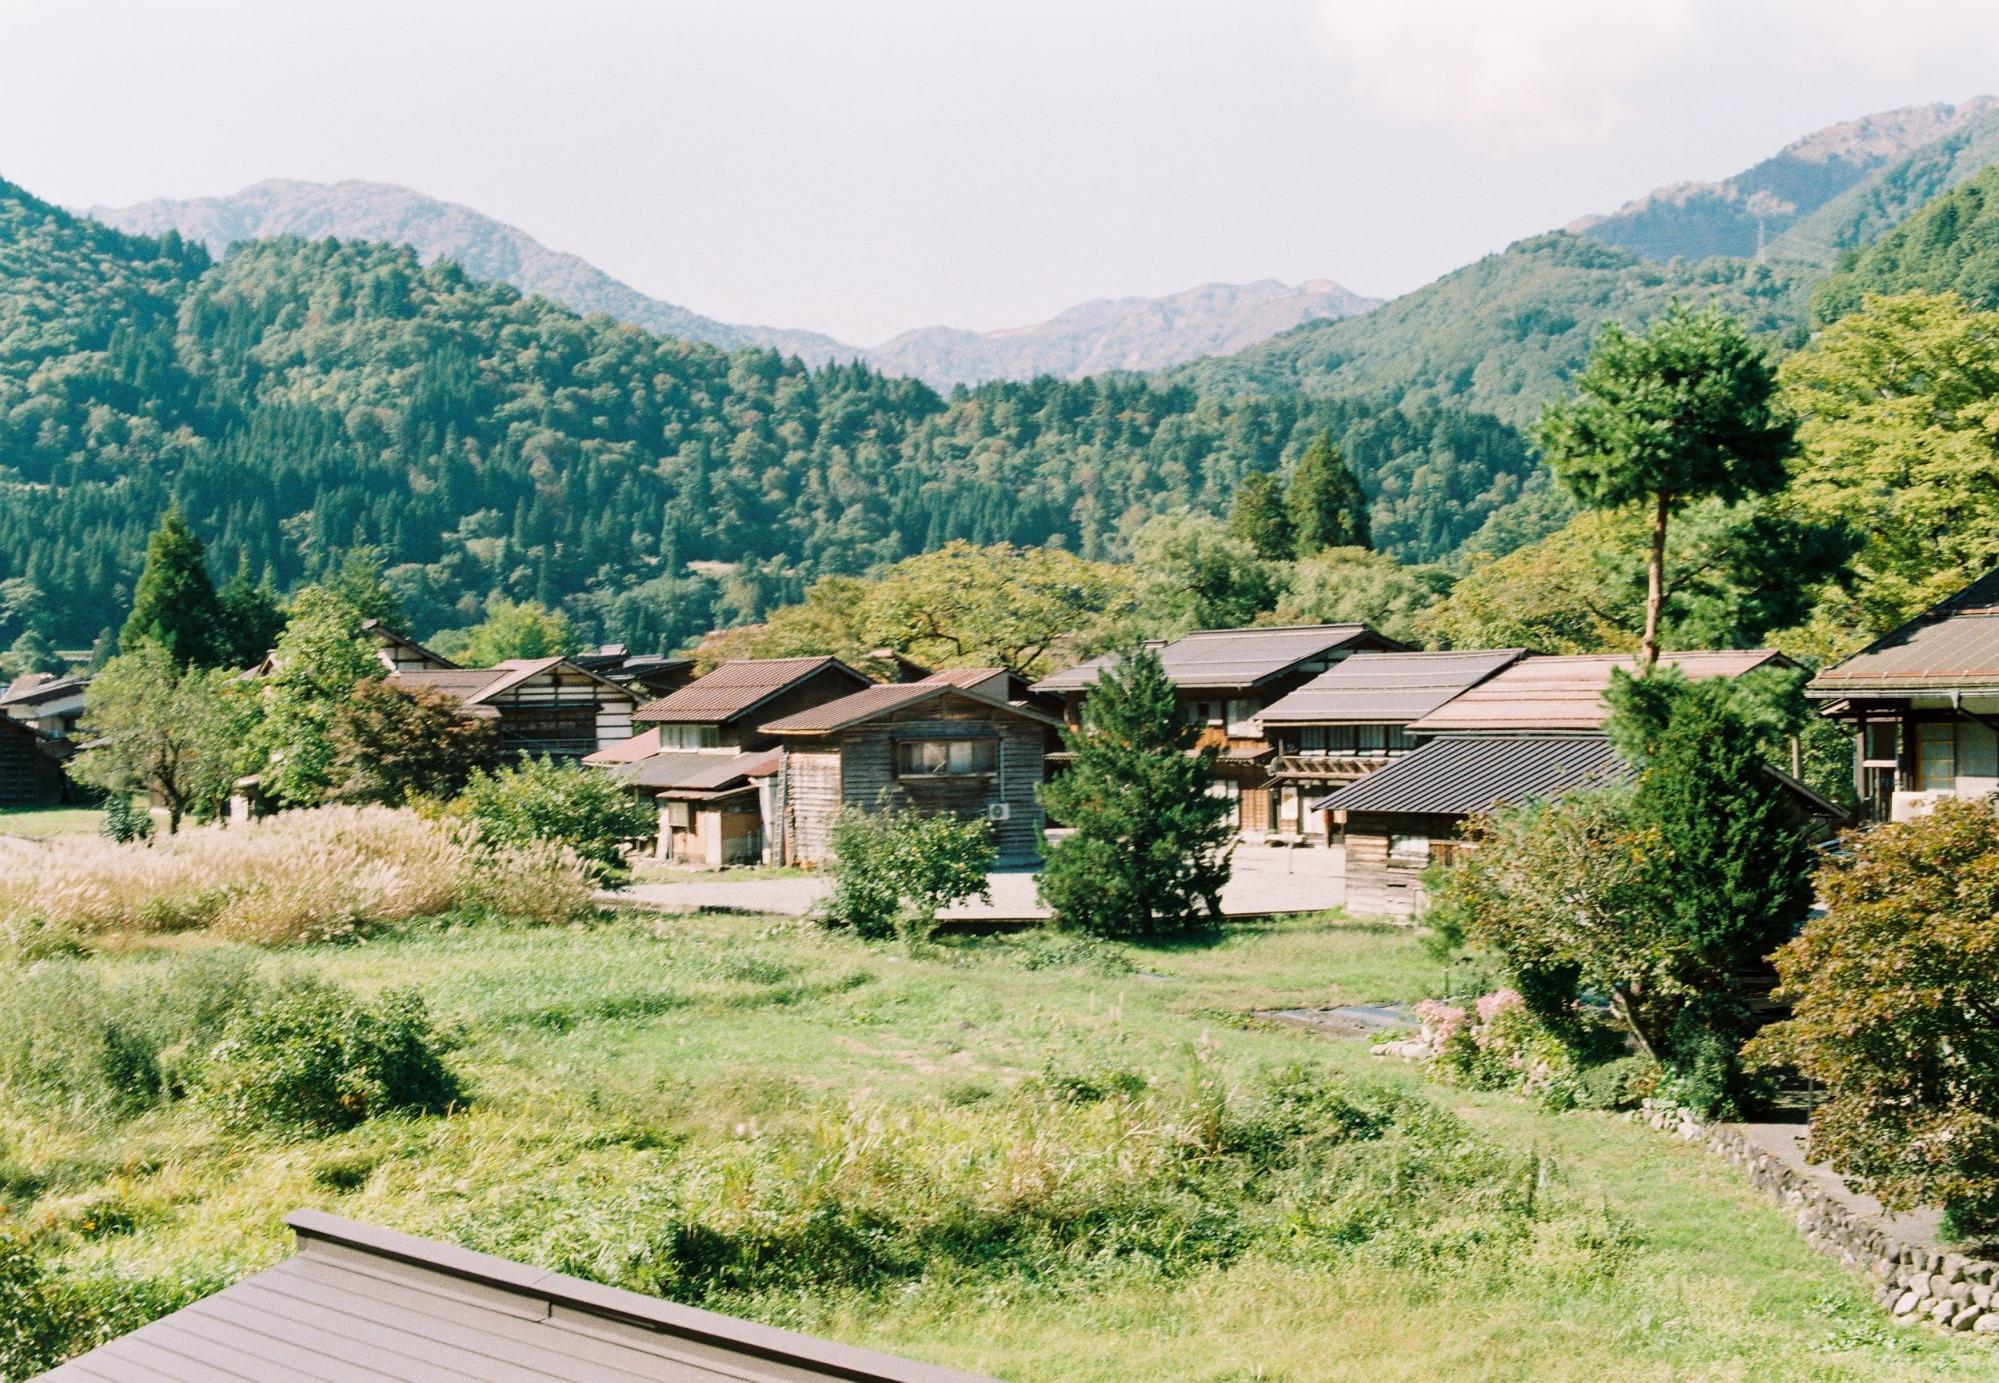 nhà cửa tại shirakawa-go